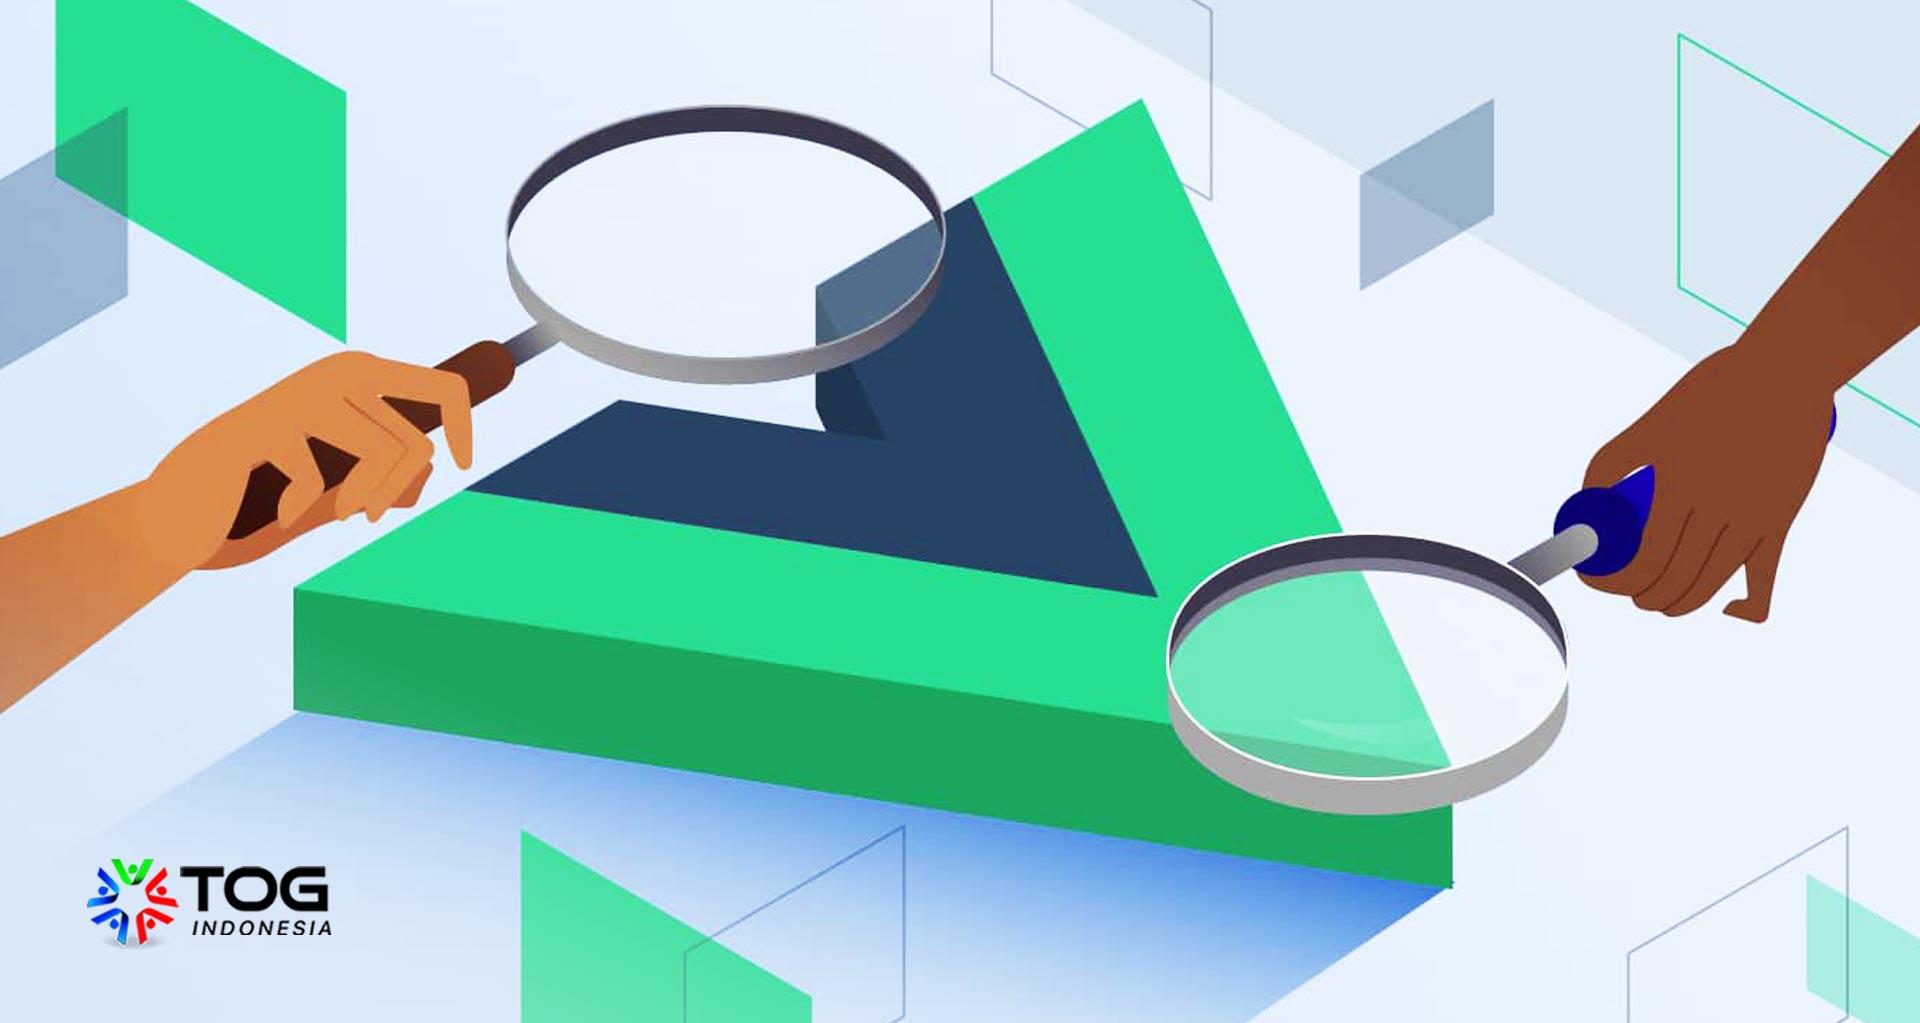 Mengenal Vue.js Secara Lengkap Plus Cara Belajar untuk Pemula